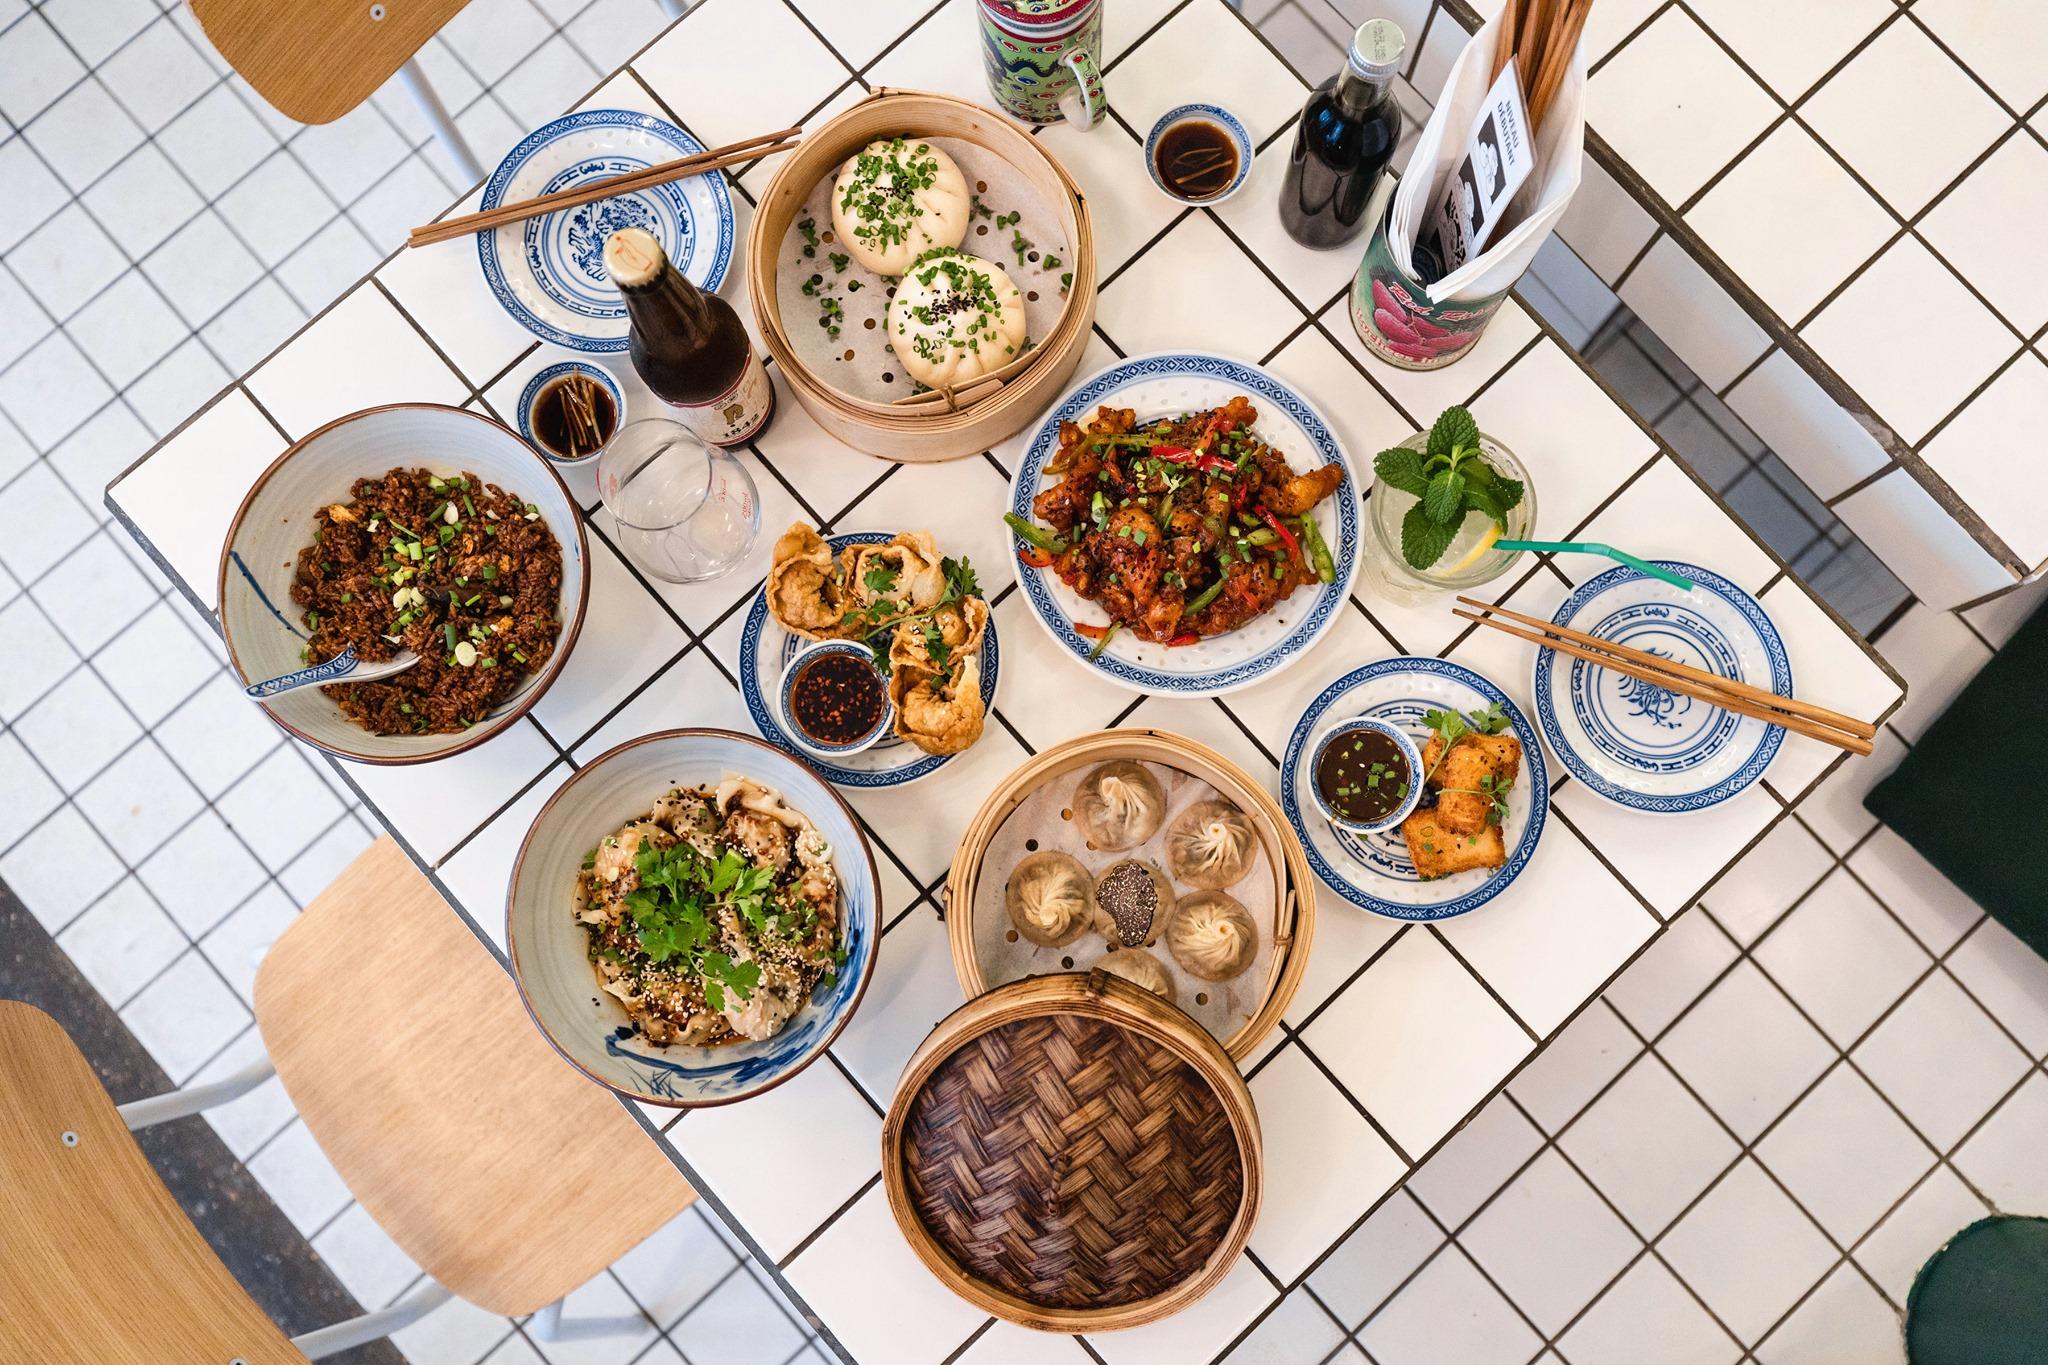 An overhead shot of food at Petit Bao, including bao buns, chao mian, wontons and more.